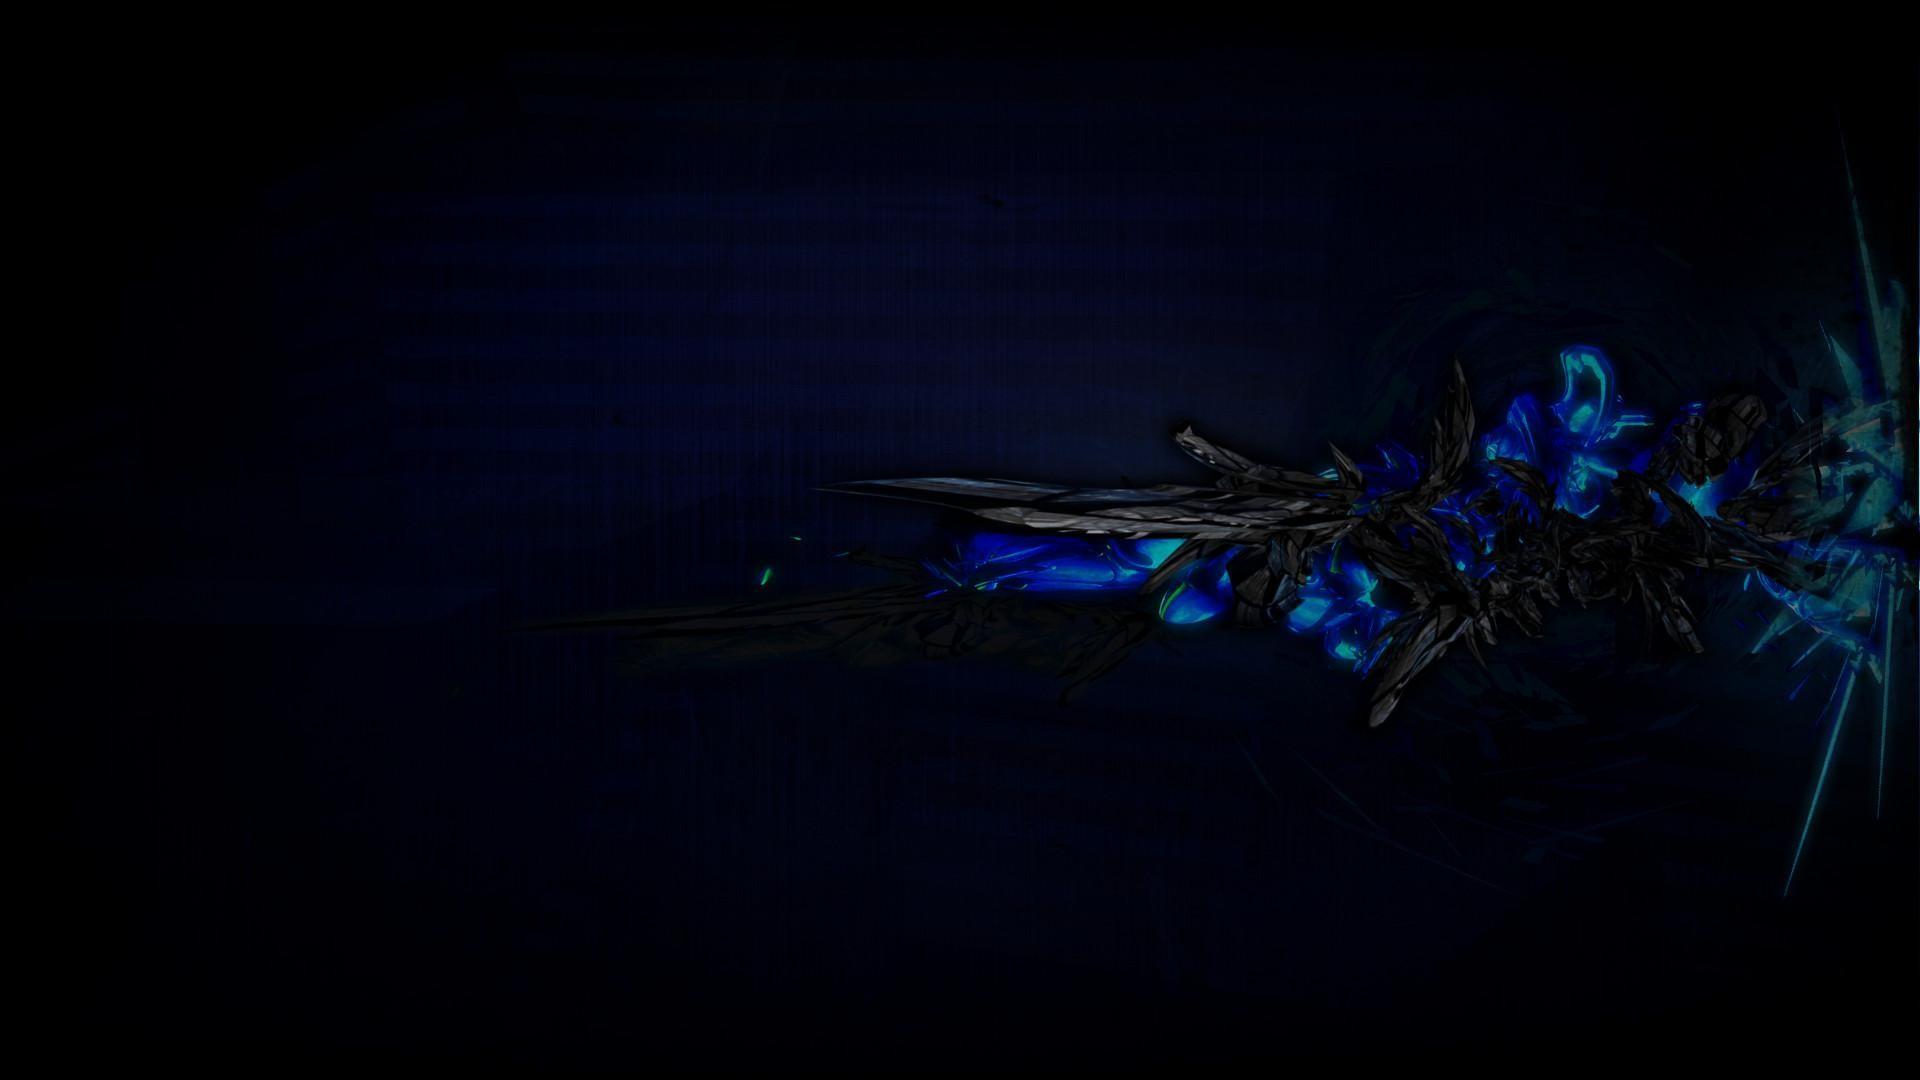 Dark-blue-pictures-wallpaper-HD